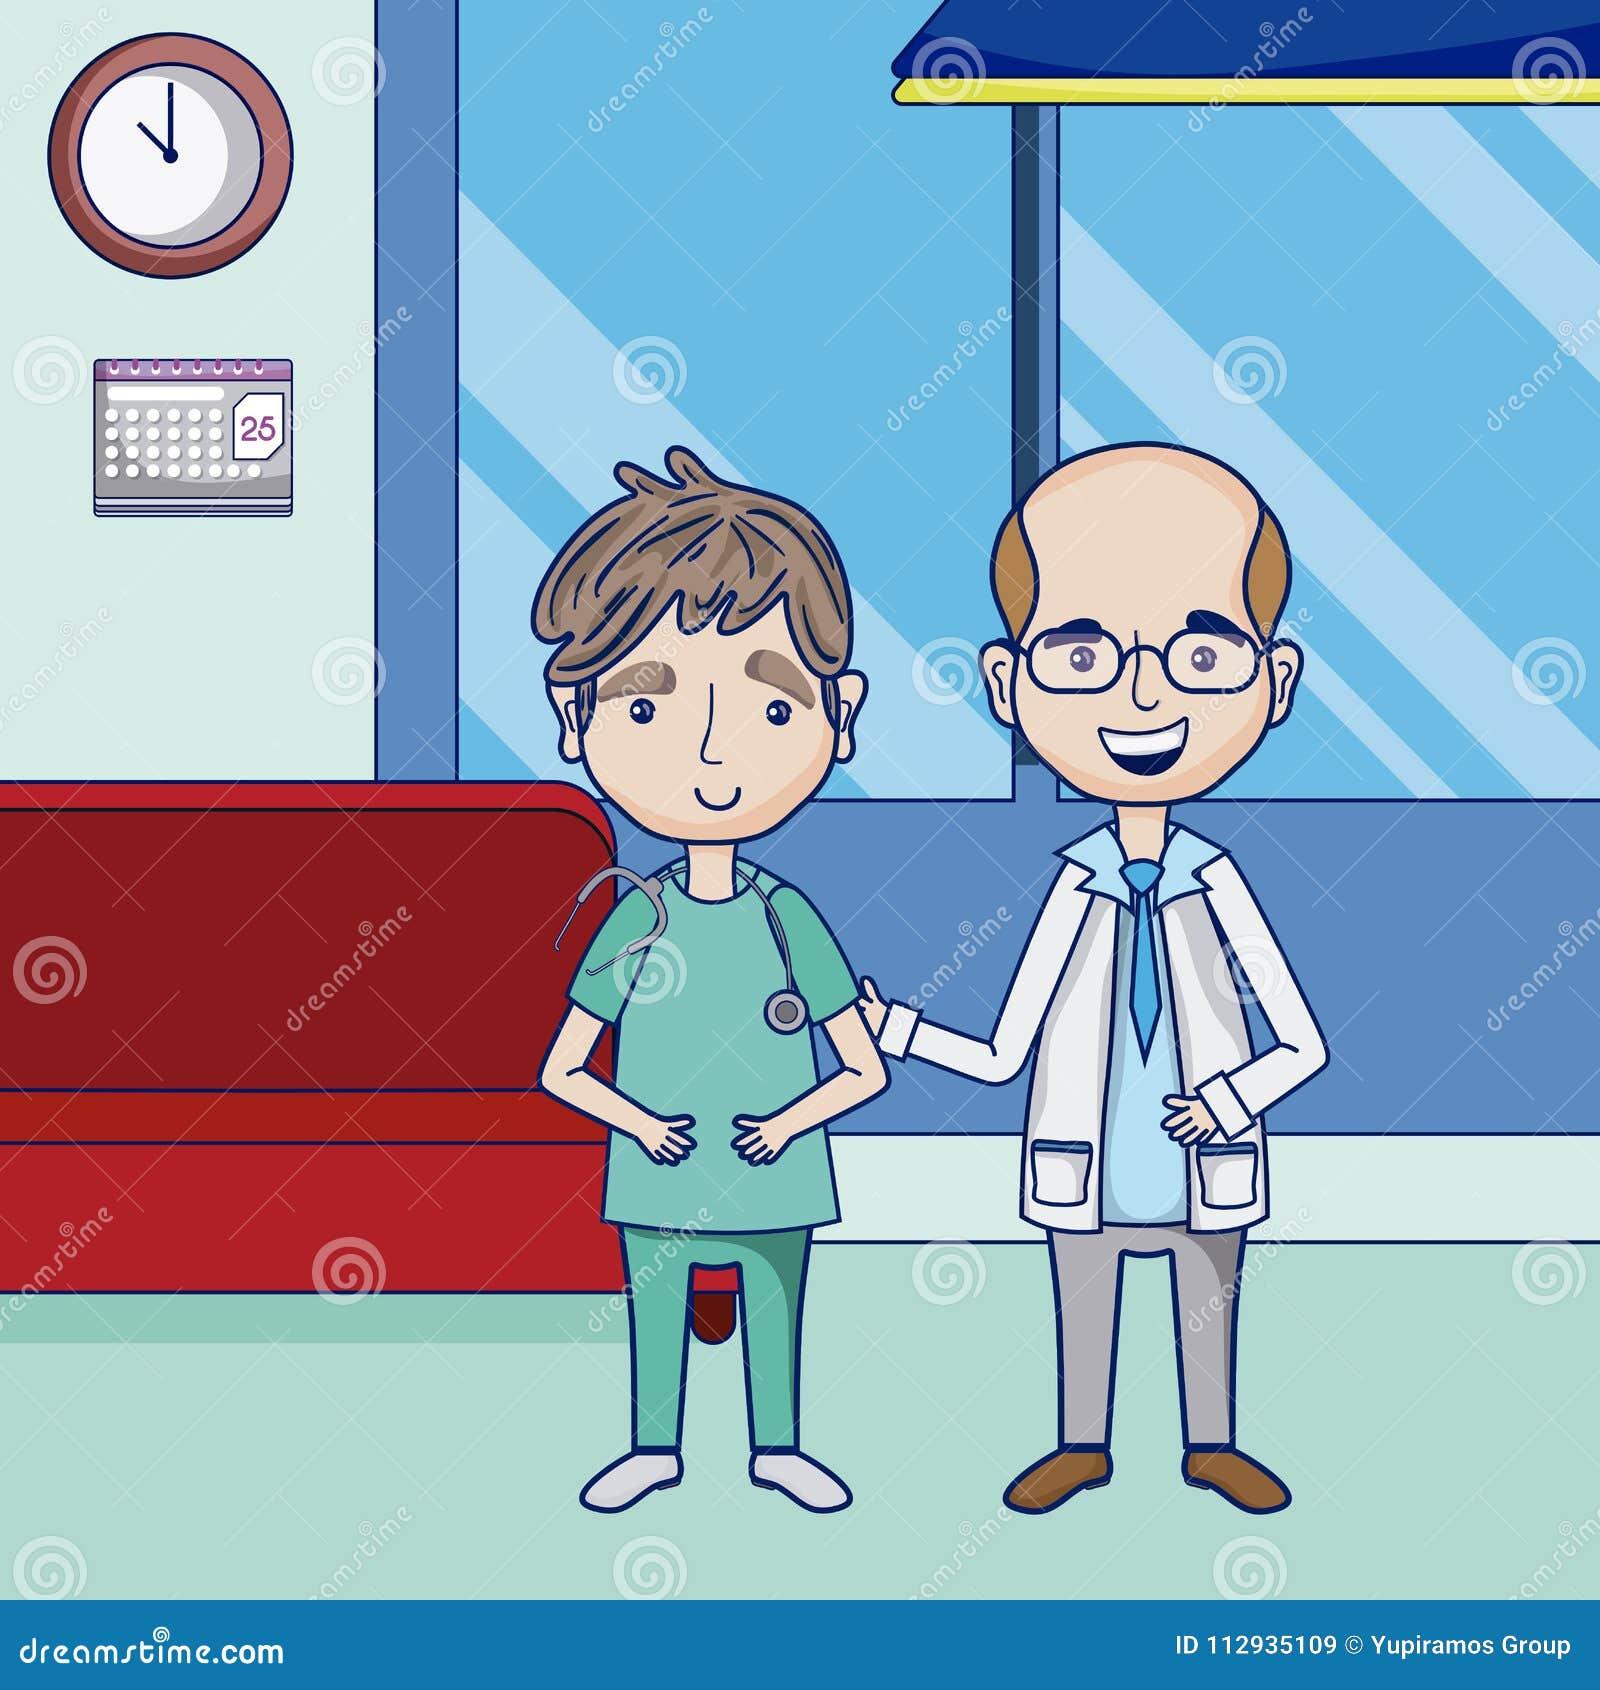 Funny Cartoon Hospital Pics funny doctors cartoons stock vector. illustration of